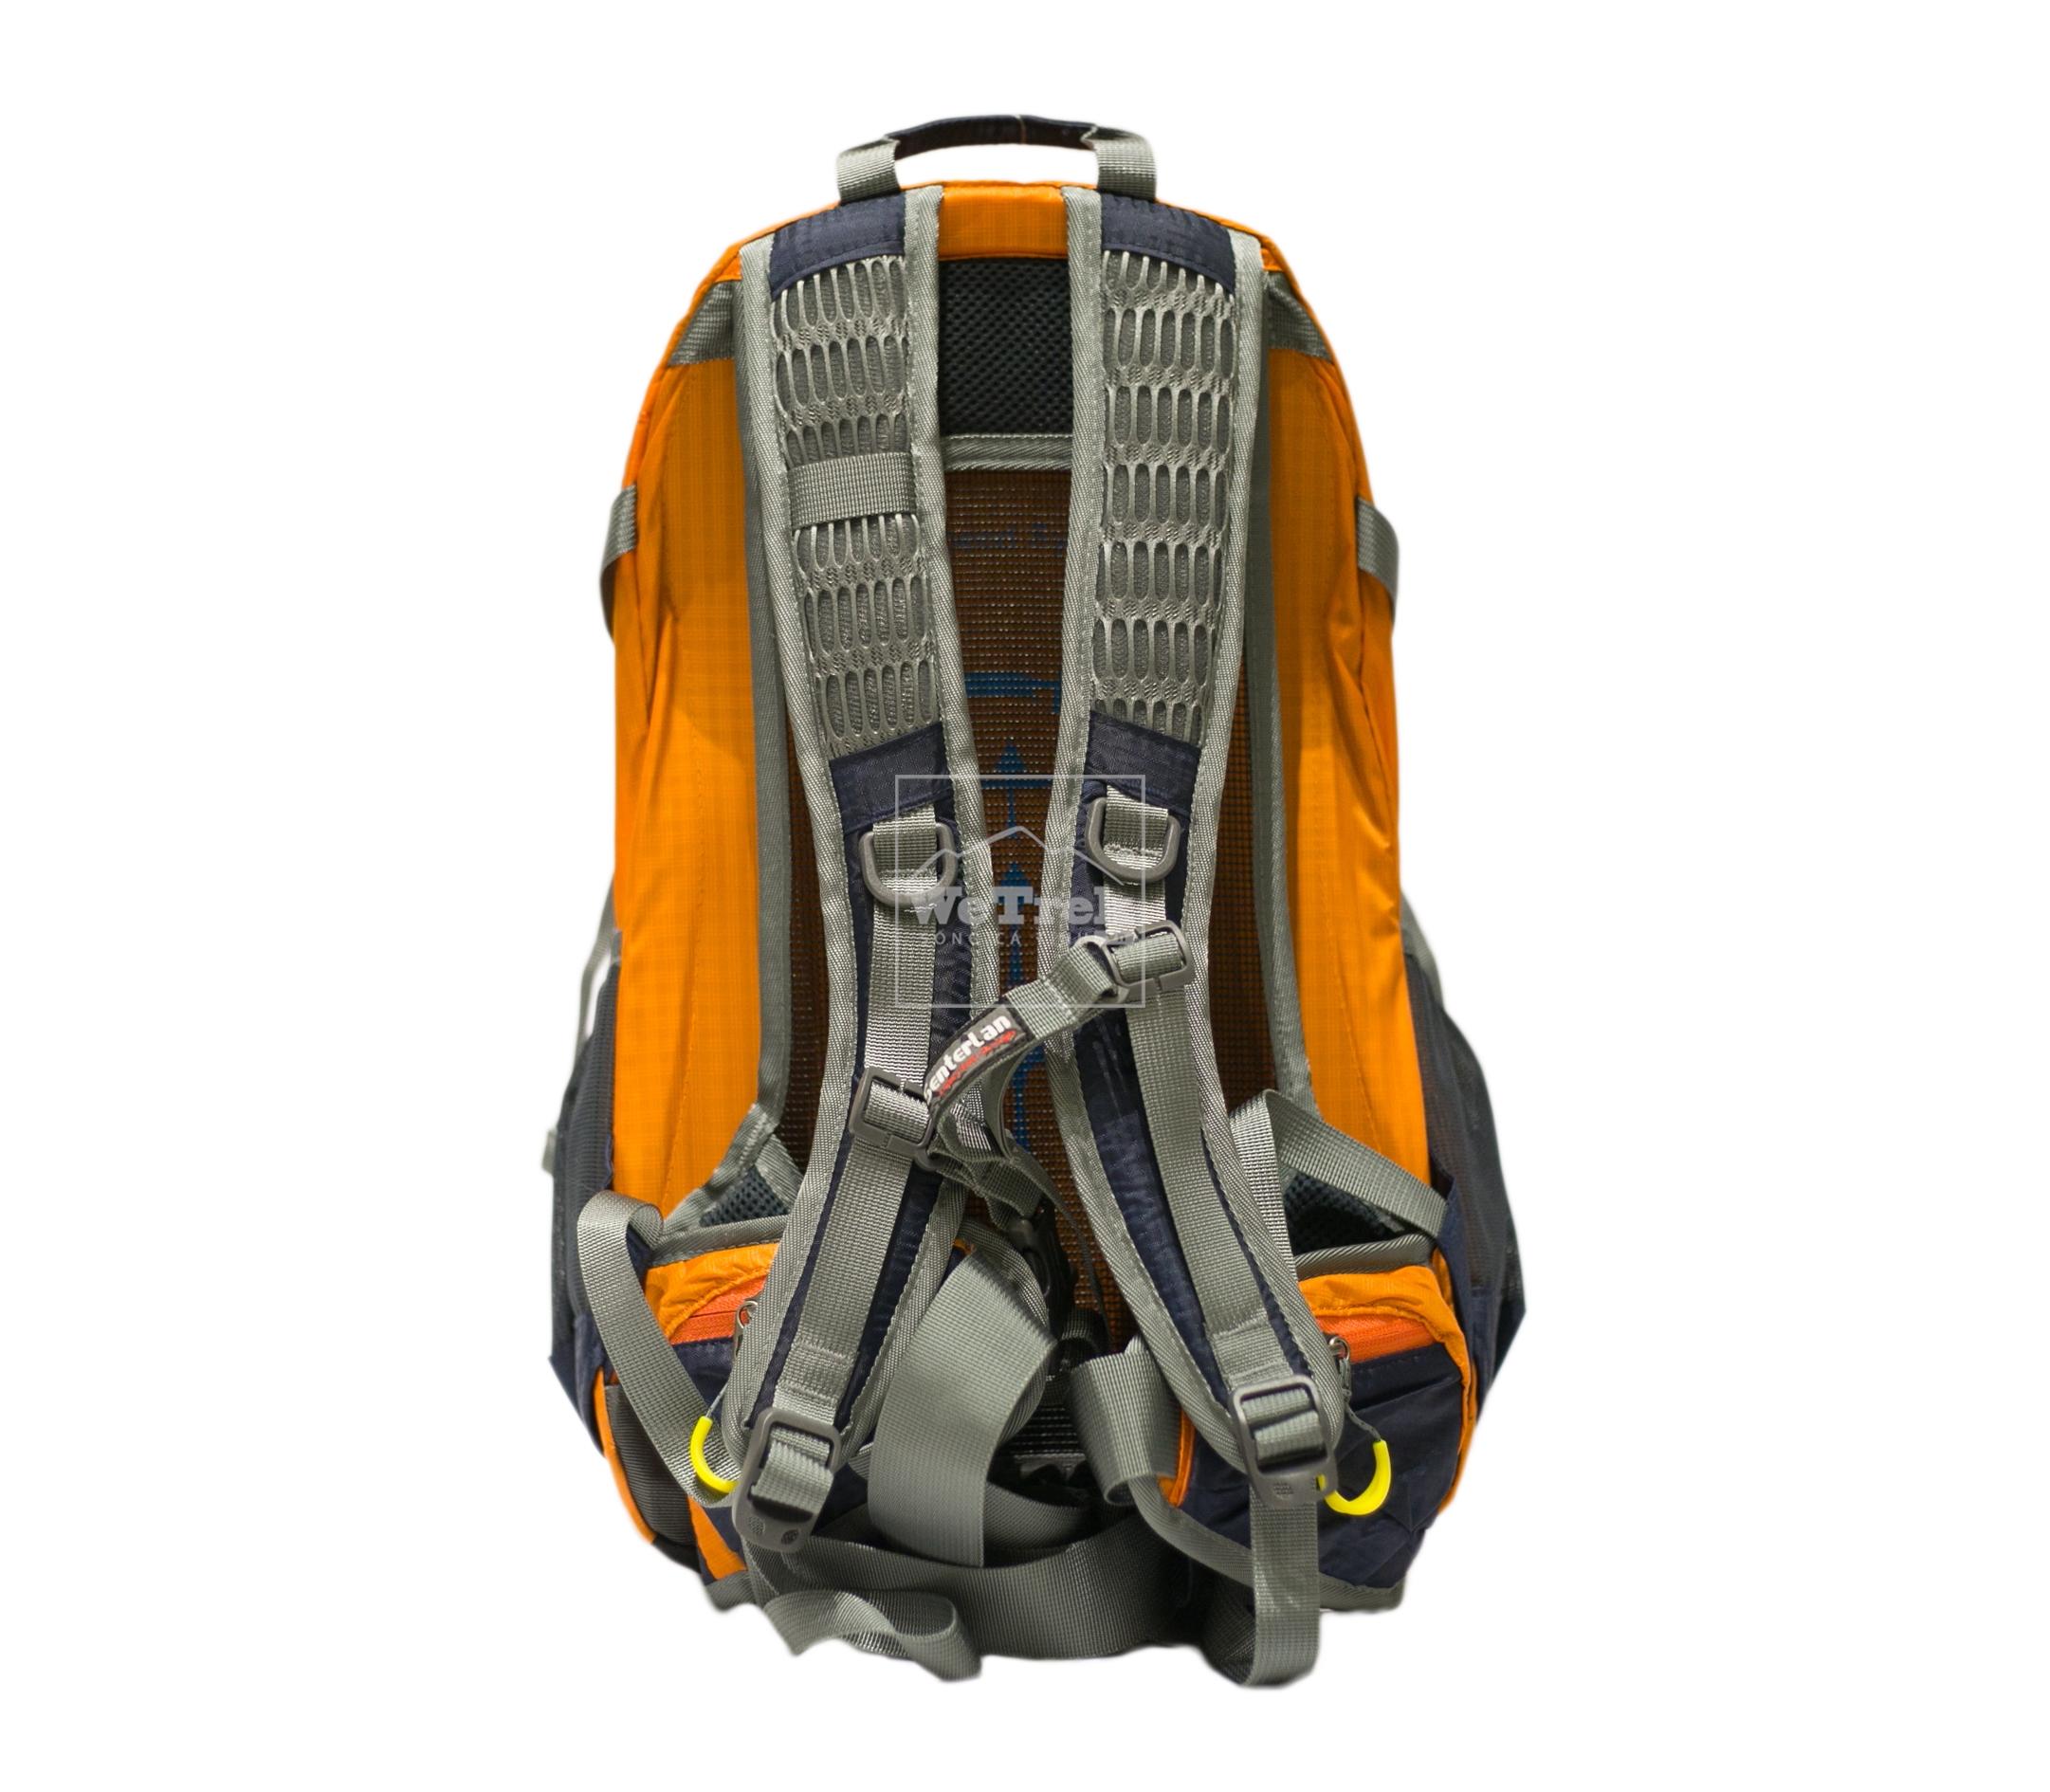 4-balo-leo-nui-Senterlan-Hiking-Outdoor-S2316-8453-Cam-wetrekvn.jpg